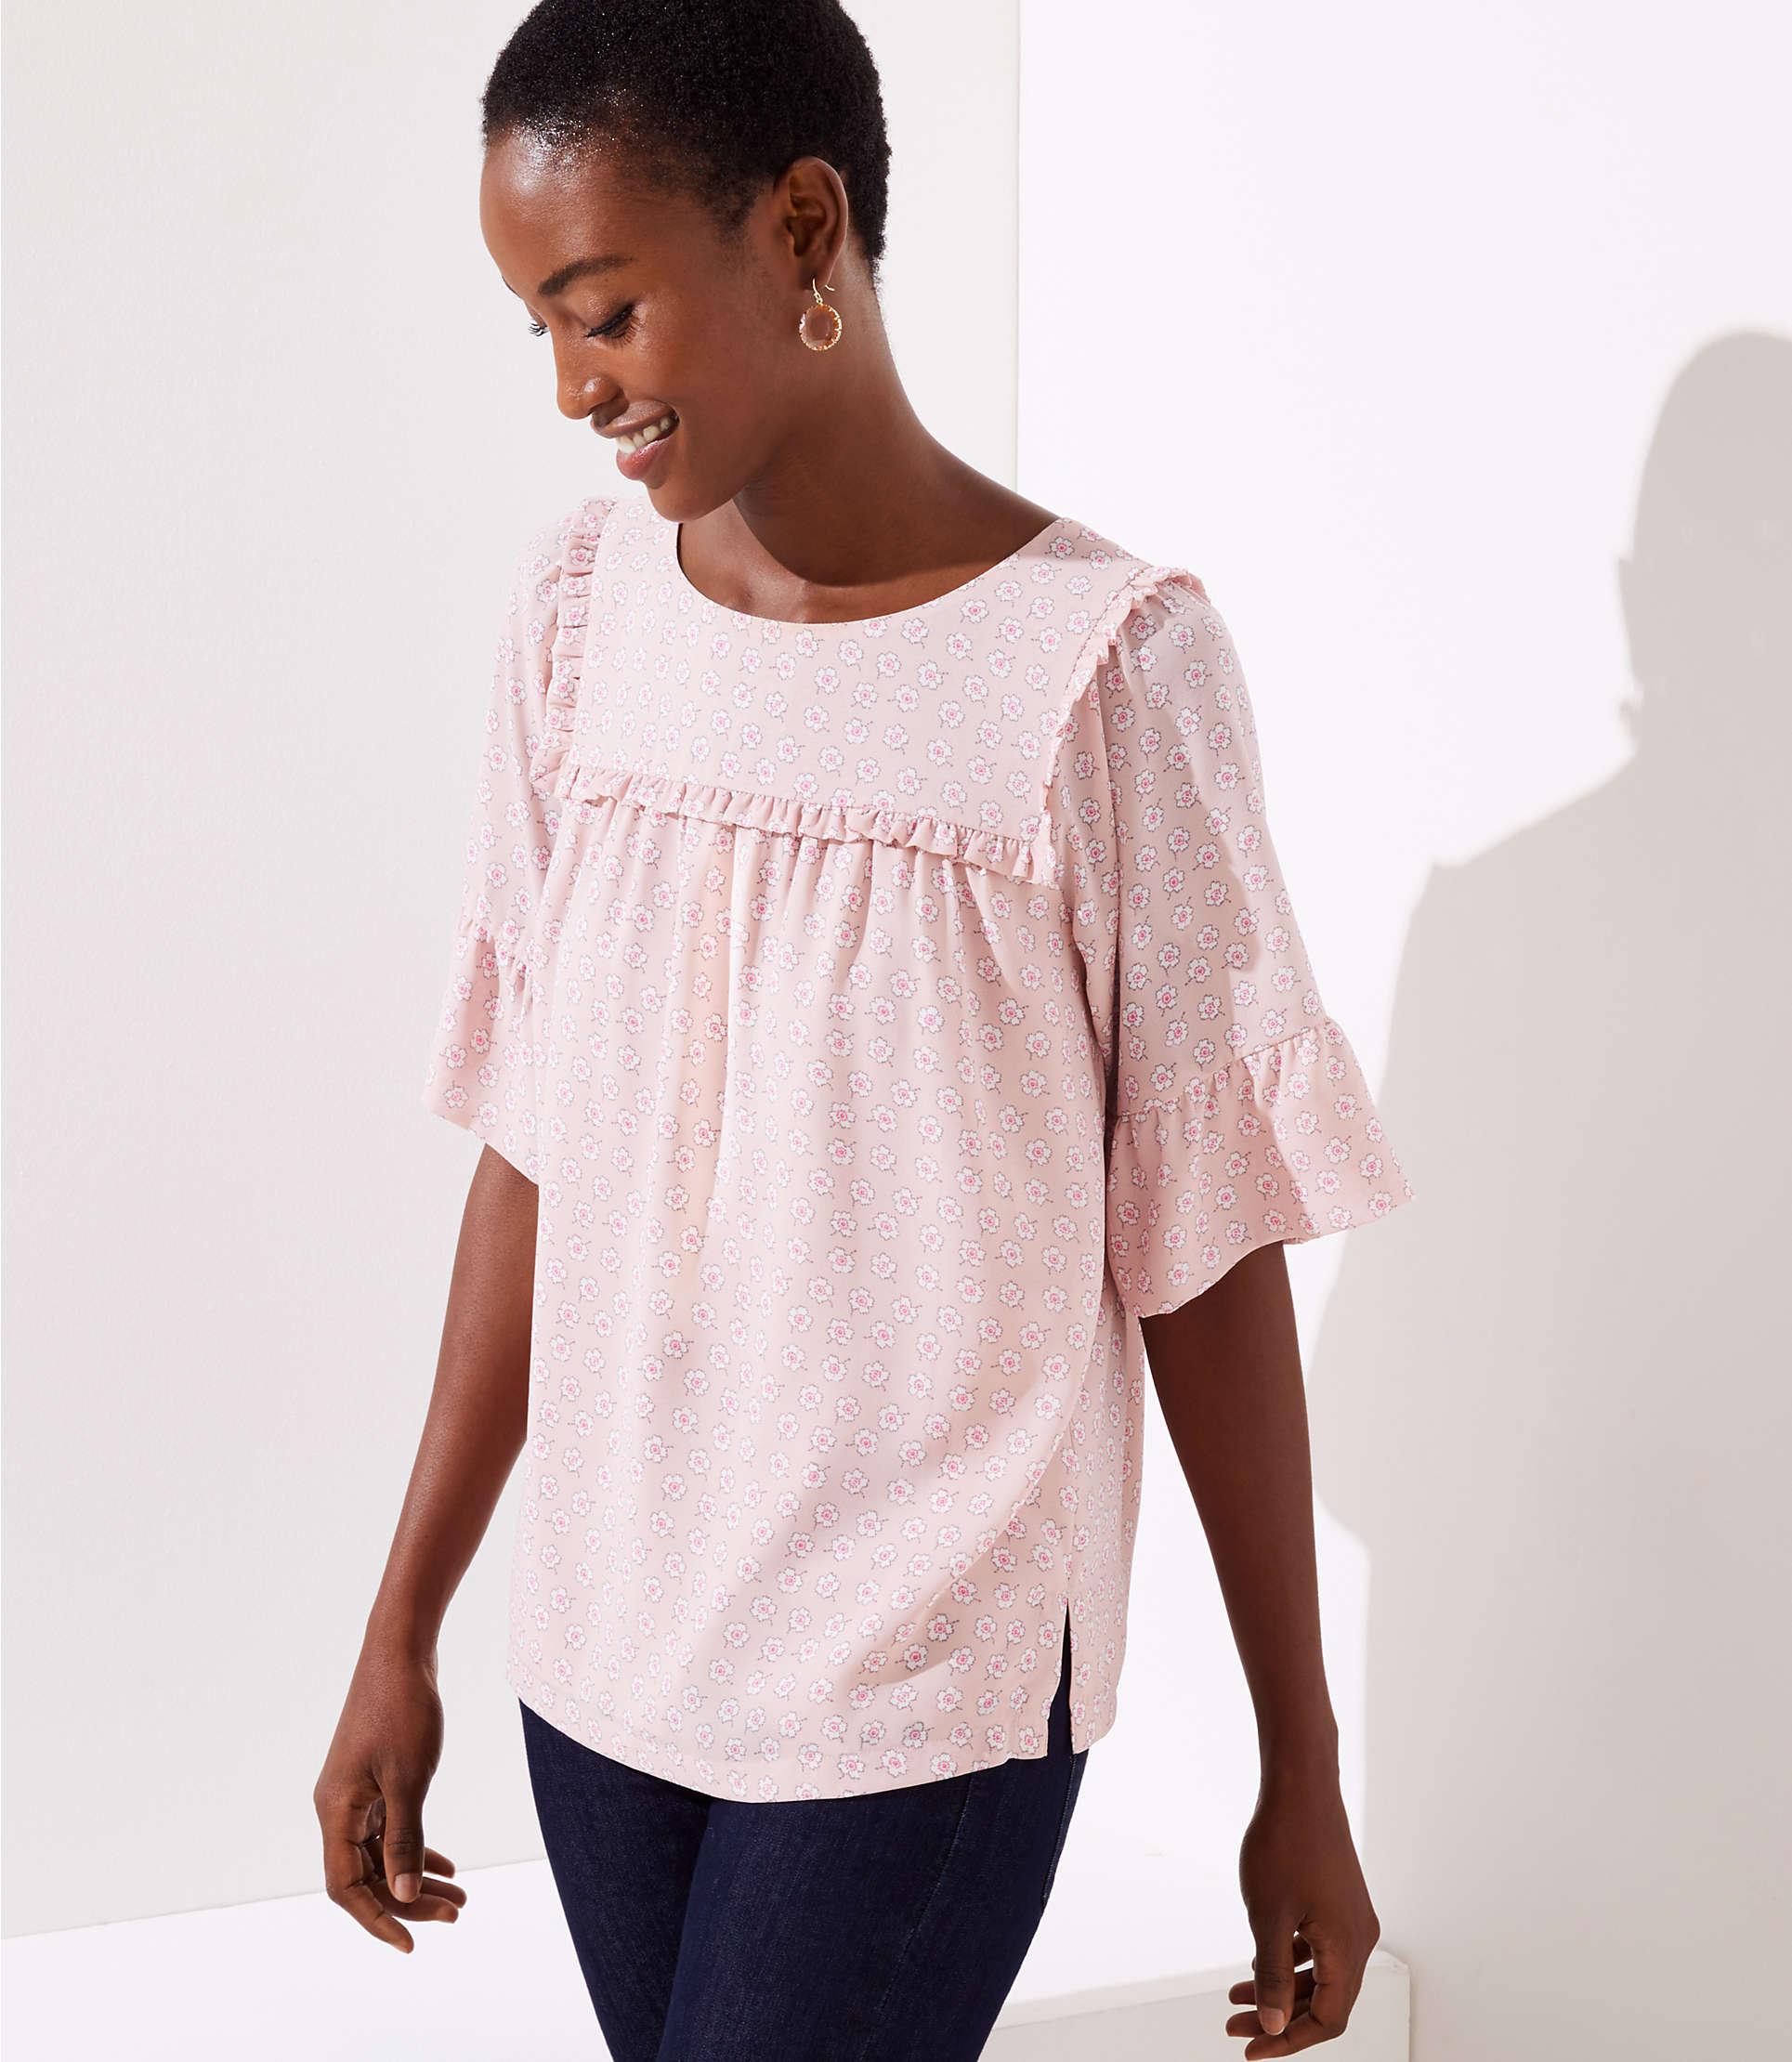 ce7ea6e45a7a43 LOFT Ruffle Yoke Bell Cuff Top in Pink - Save 20% - Lyst